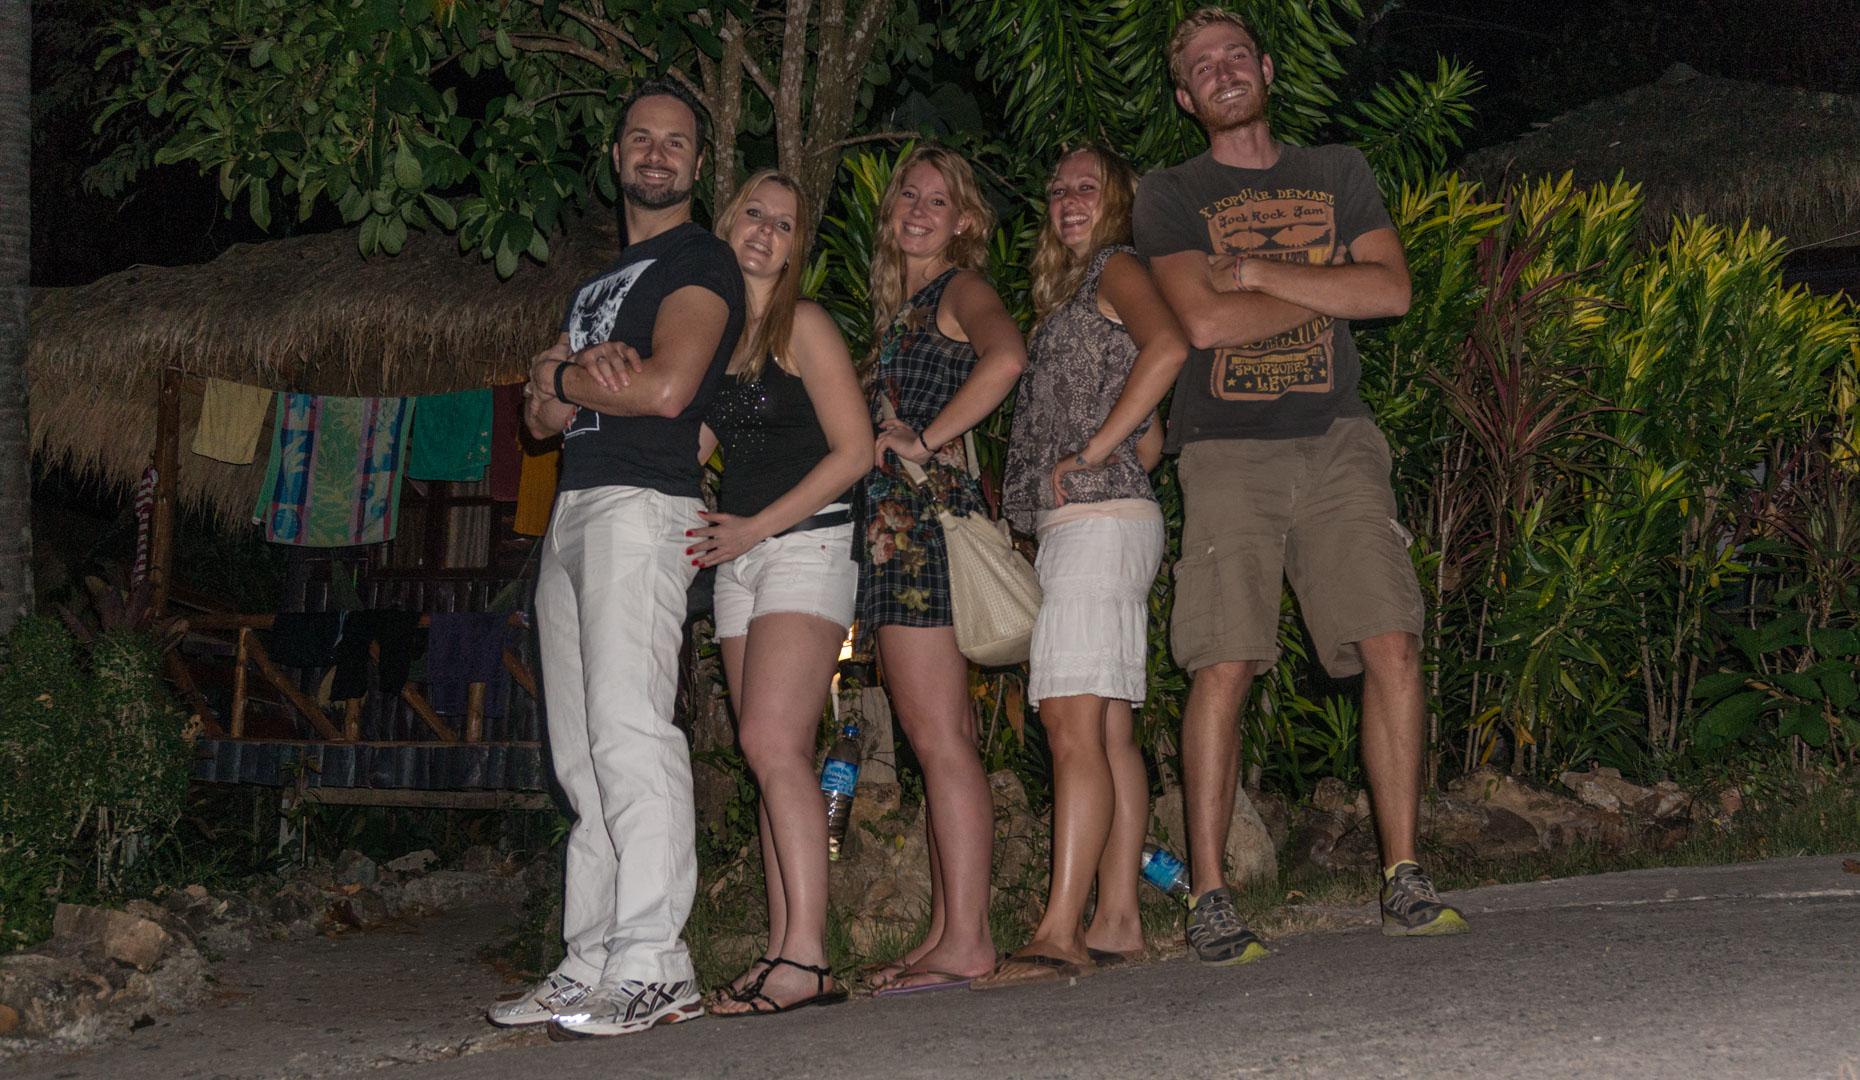 Raphael,Kady,Anni, Lisa und Patrick